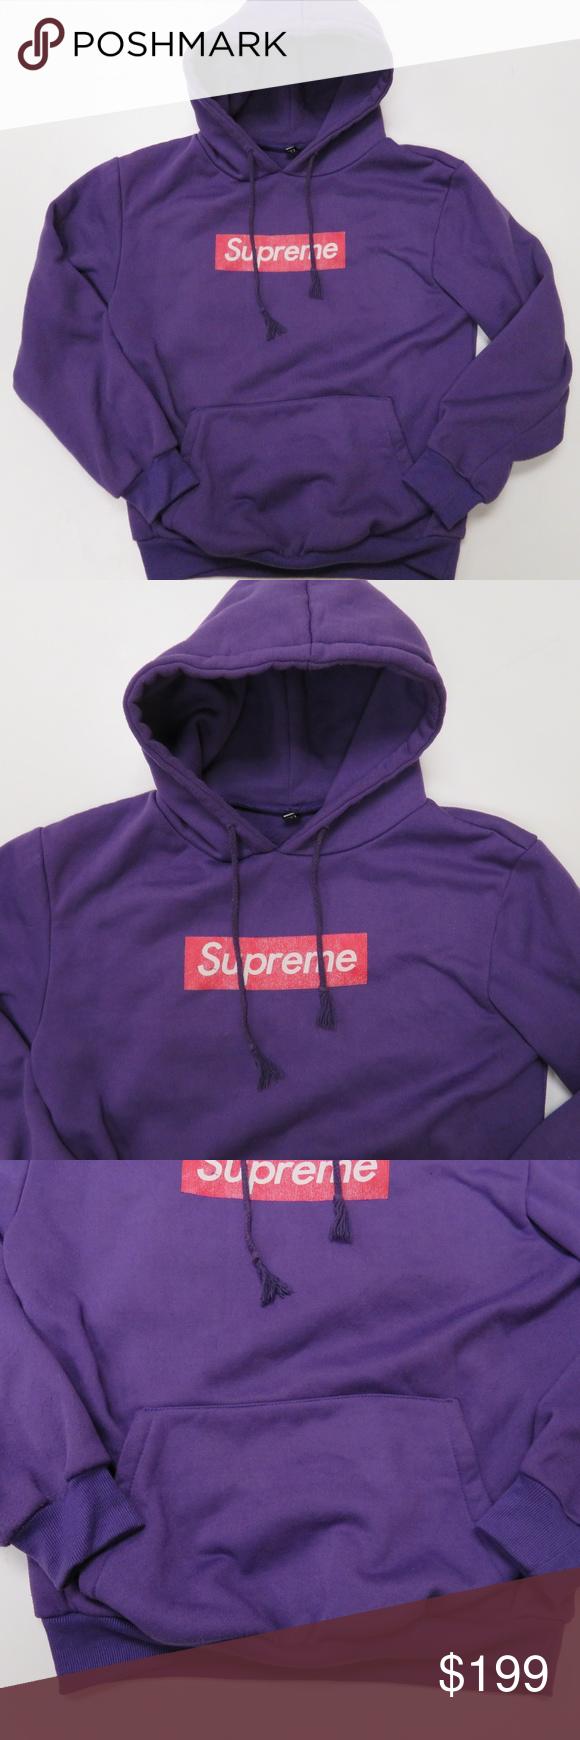 Supreme Box Logo Purple Hoodie Medium Supreme Women S Size Medium Purple Pullover Hooded Sweatshirt It Has Some Pilling Purple Hoodie Hoodies Clothes Design [ 1740 x 580 Pixel ]